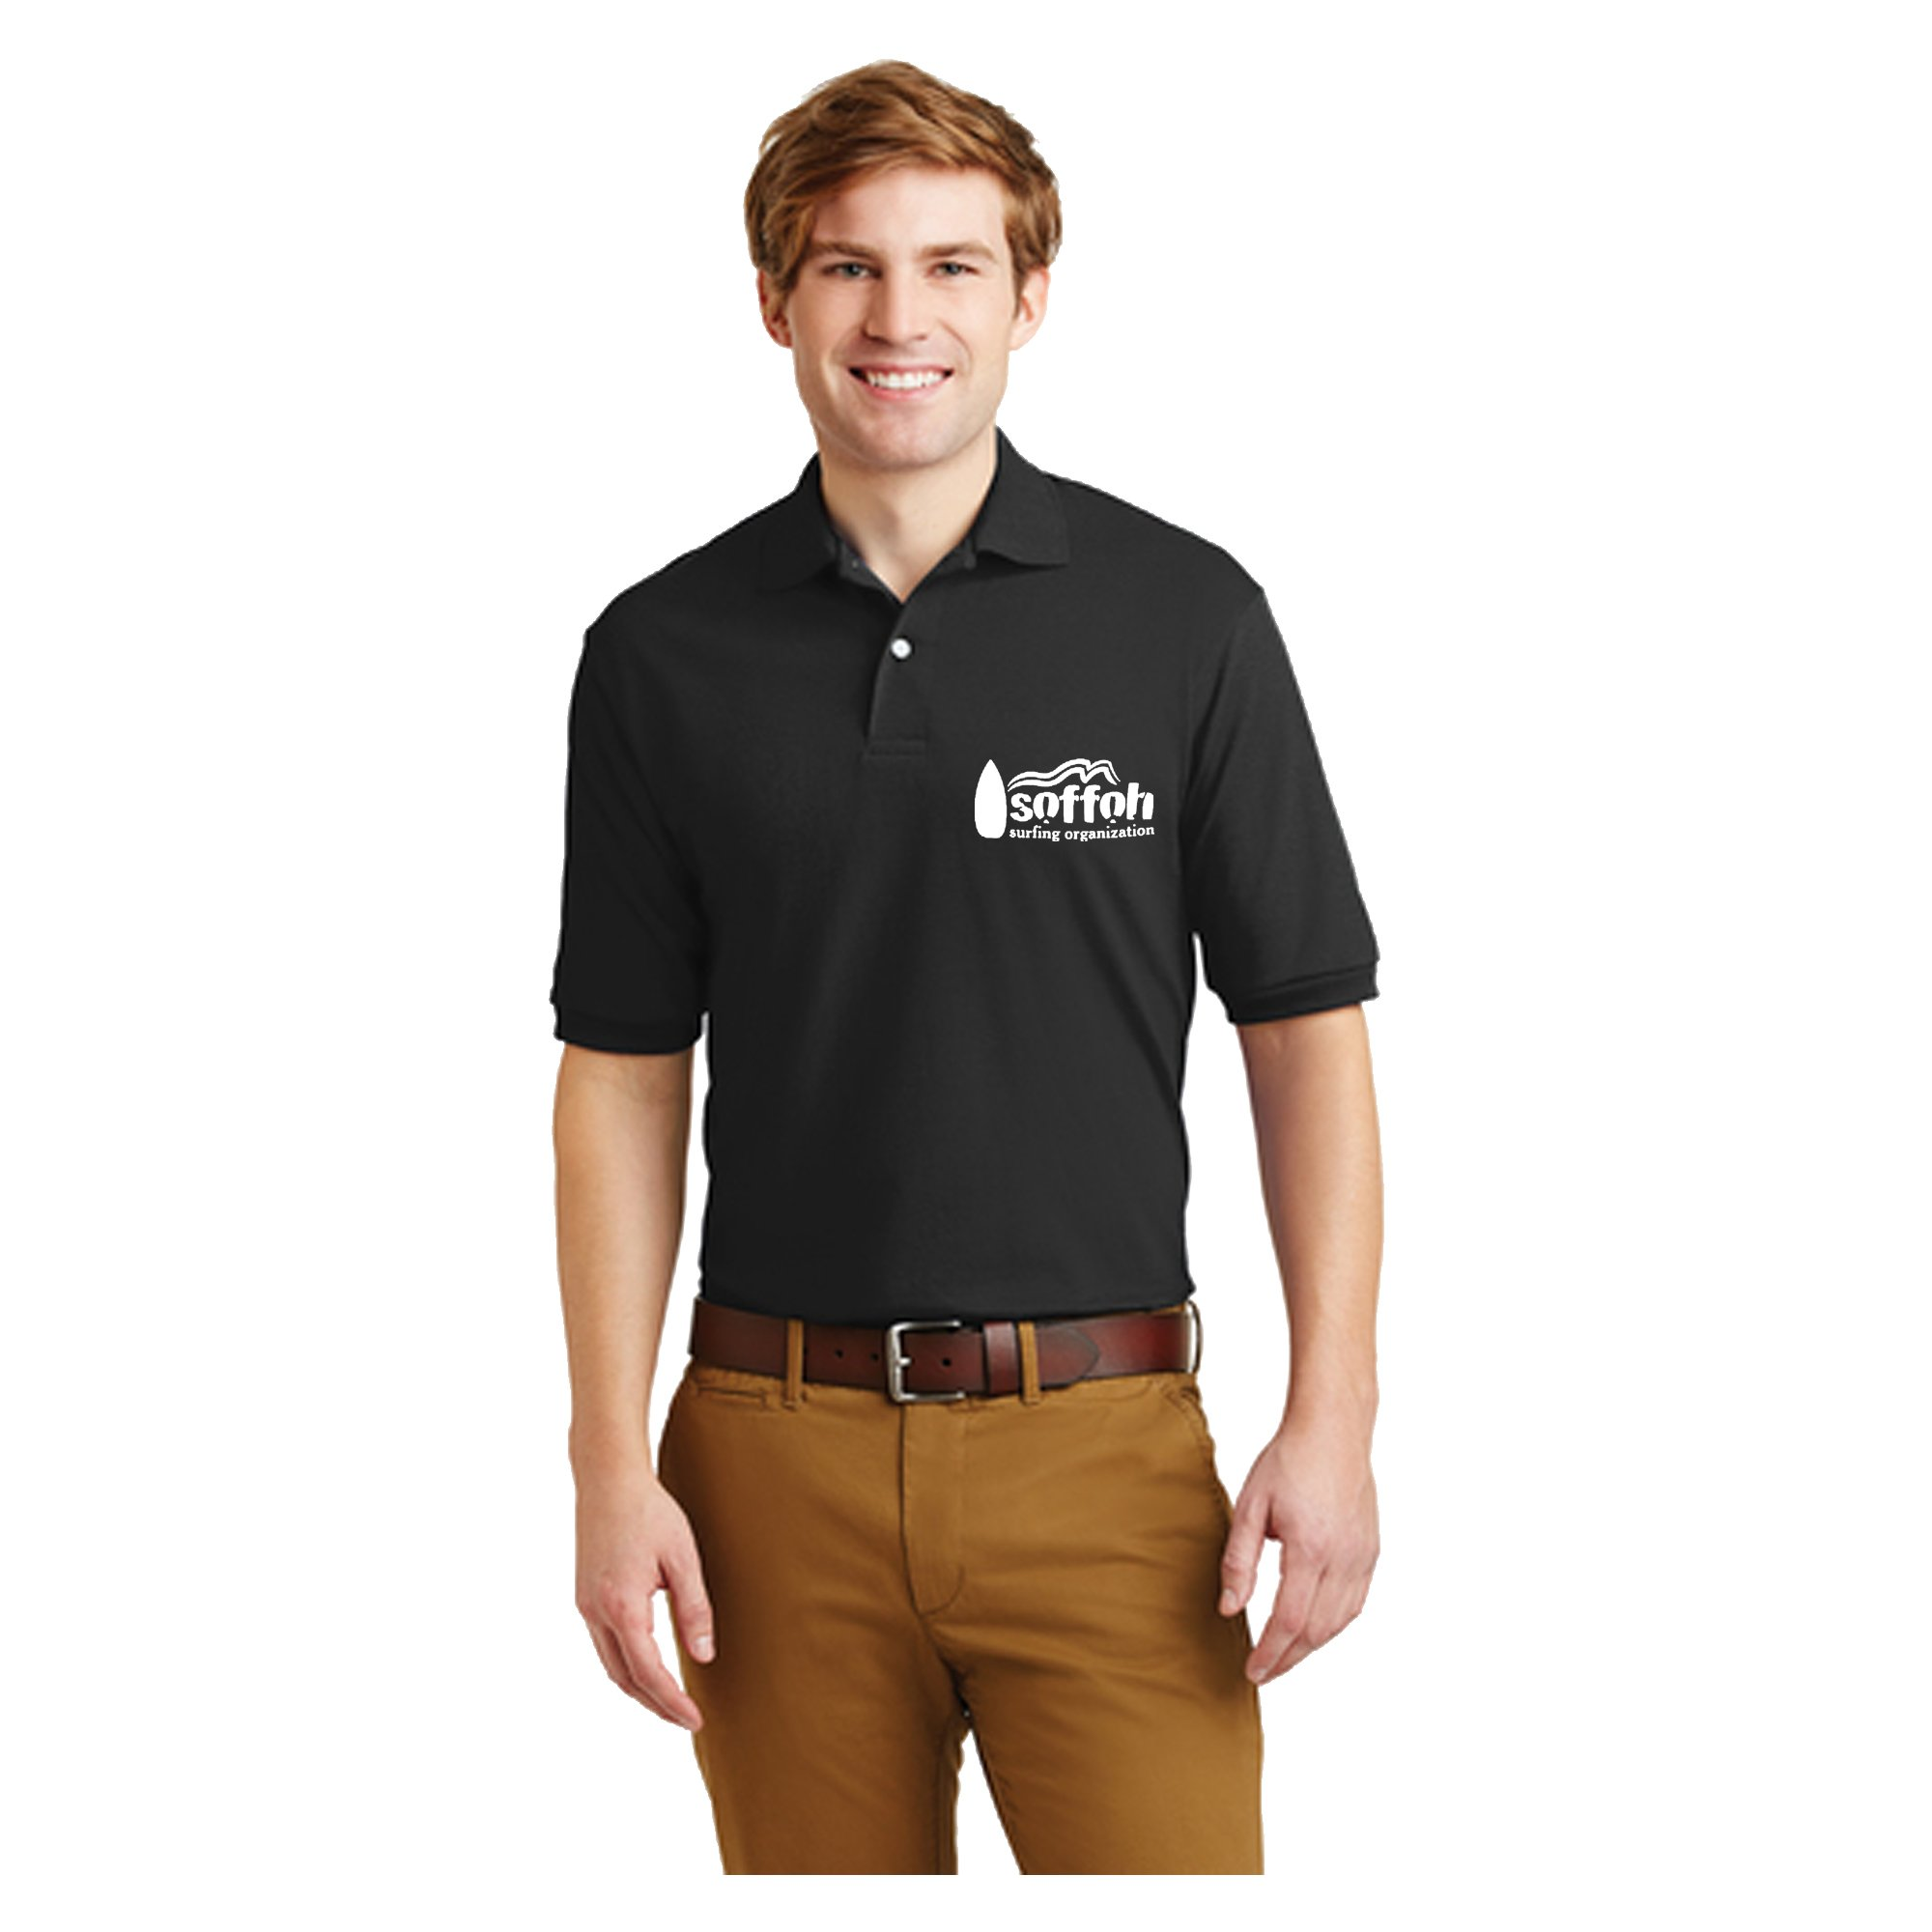 ade81c09 Promotional Jerzees®-SpotShield™ 5.6oz Jersey Knit Color Shirt | National  Pen